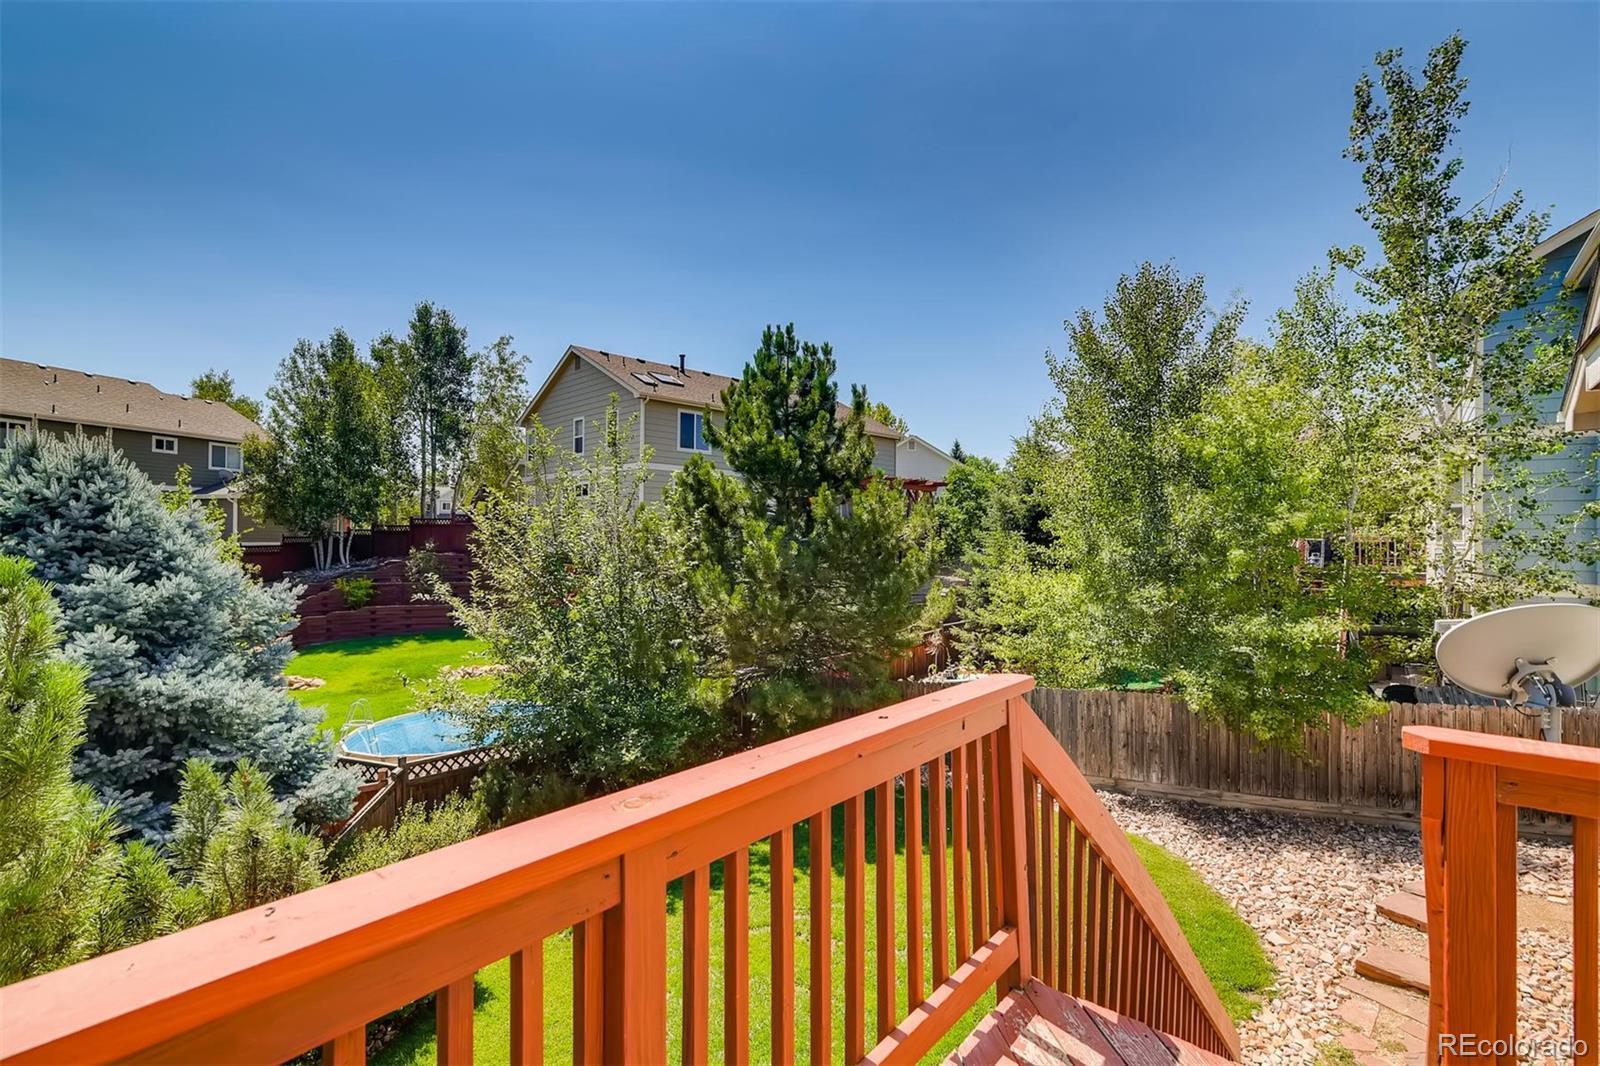 MLS# 9724731 - 27 - 498 Promontory Drive, Loveland, CO 80537